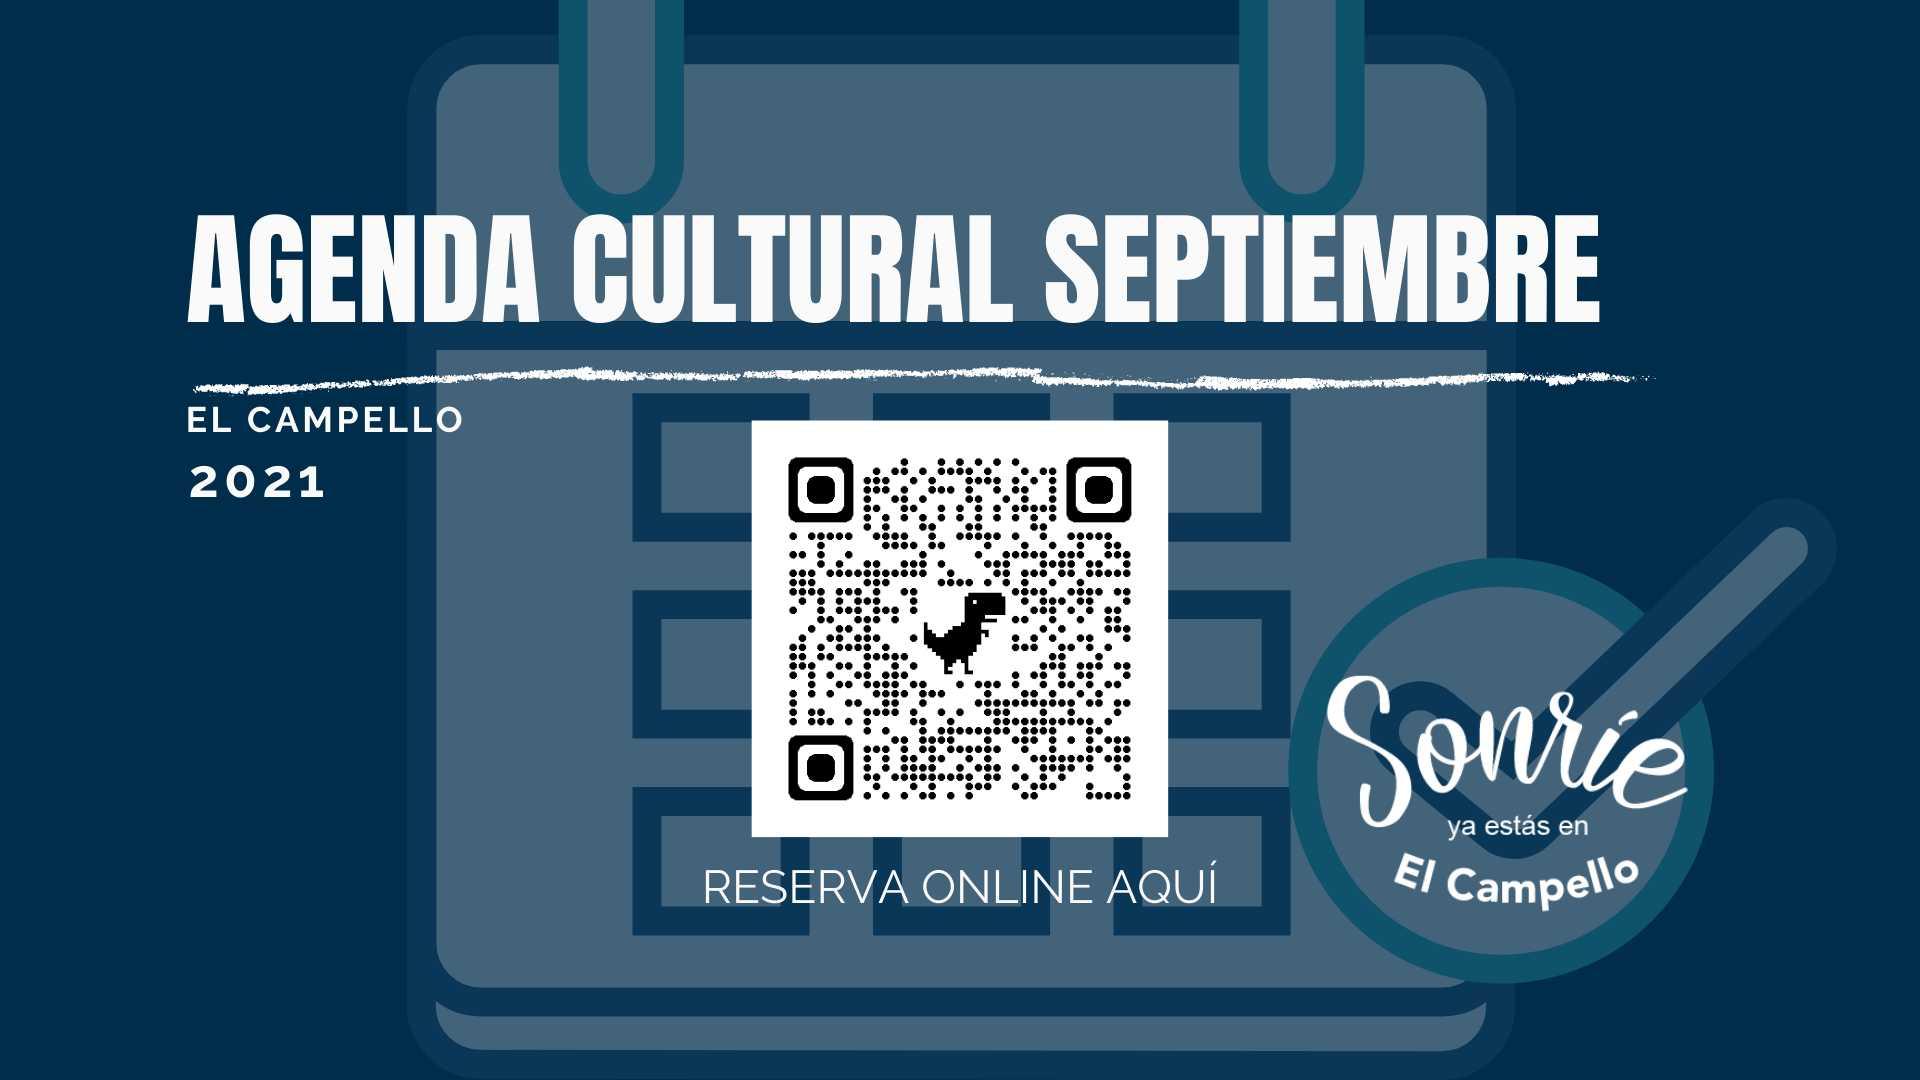 Agenda cultural septiembre 2021 | El Campello